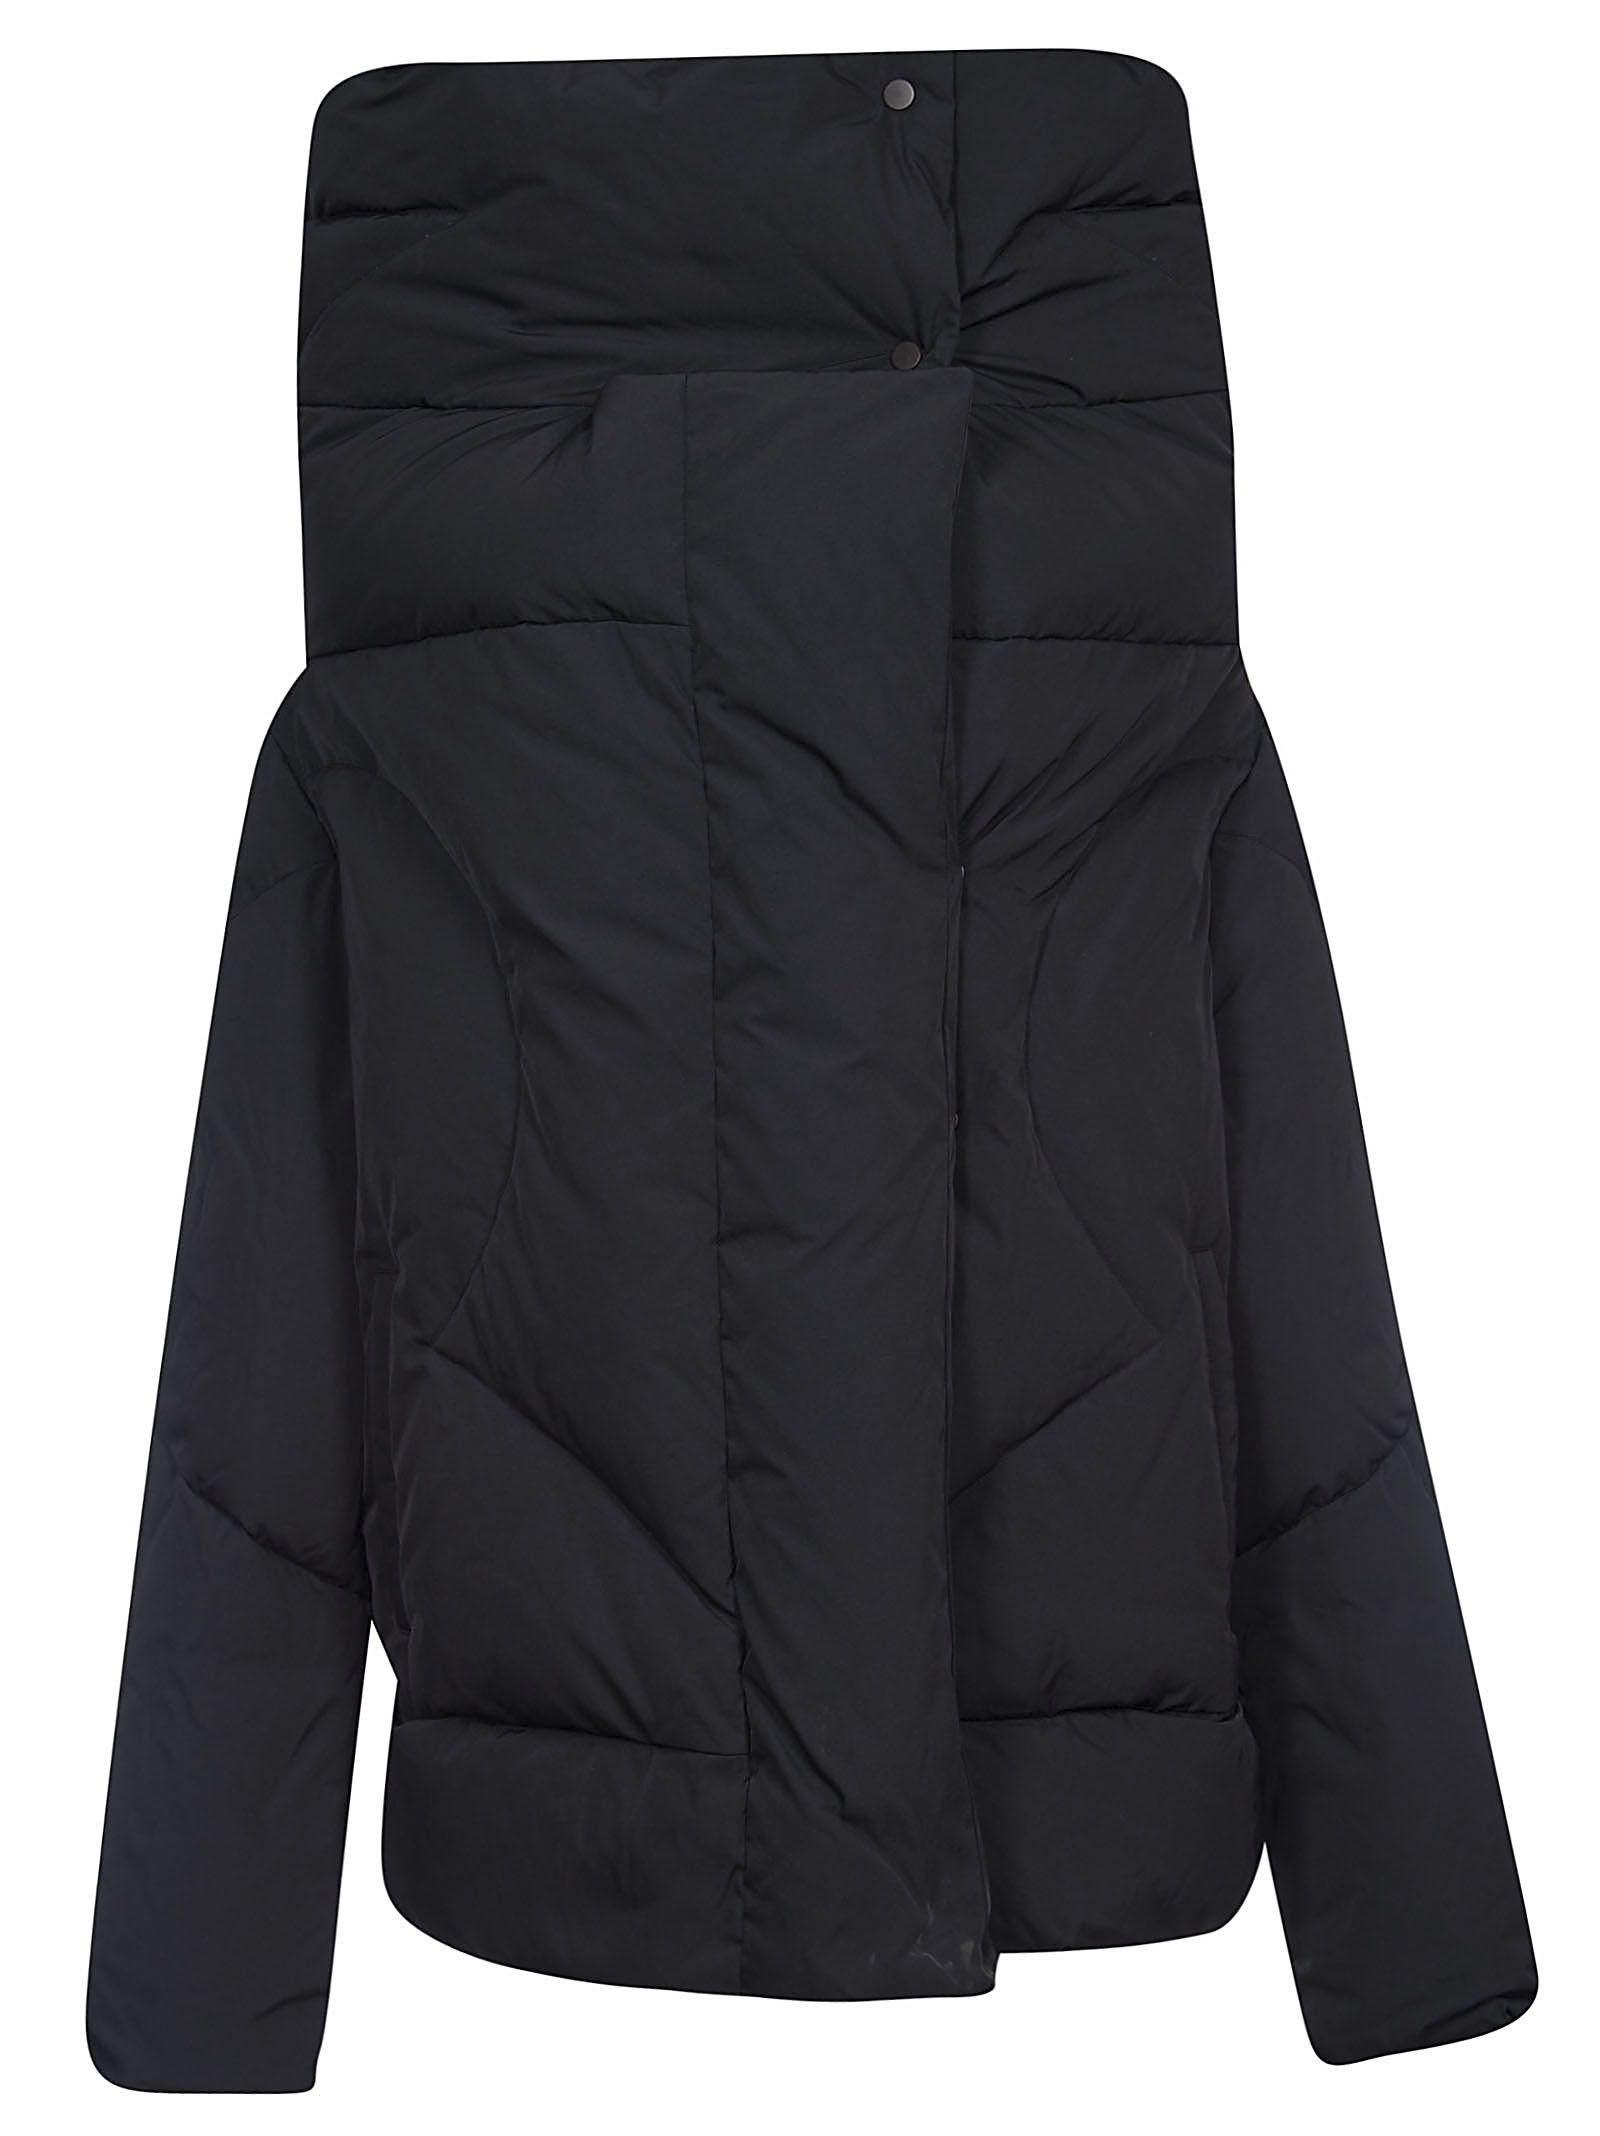 AHIRAIN High Collar Padded Jacket in Black